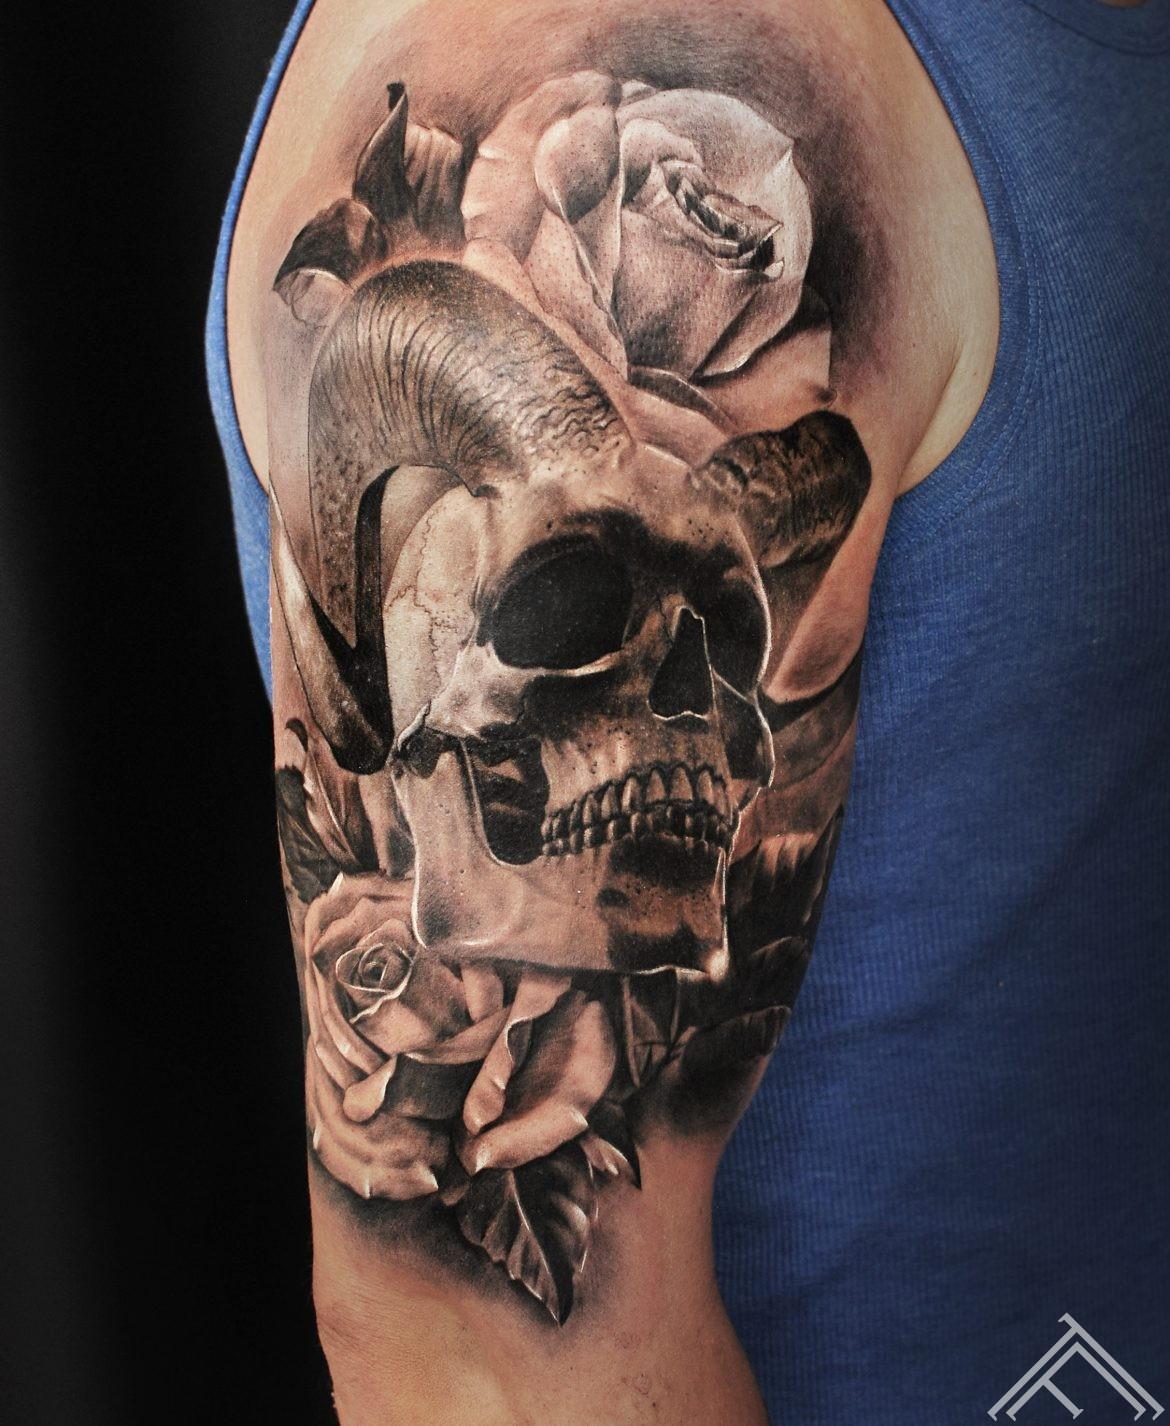 janisanderson-skull-roses-tattoo-galvaskauss-rozes-tetovejums-tattoofrequency-riga